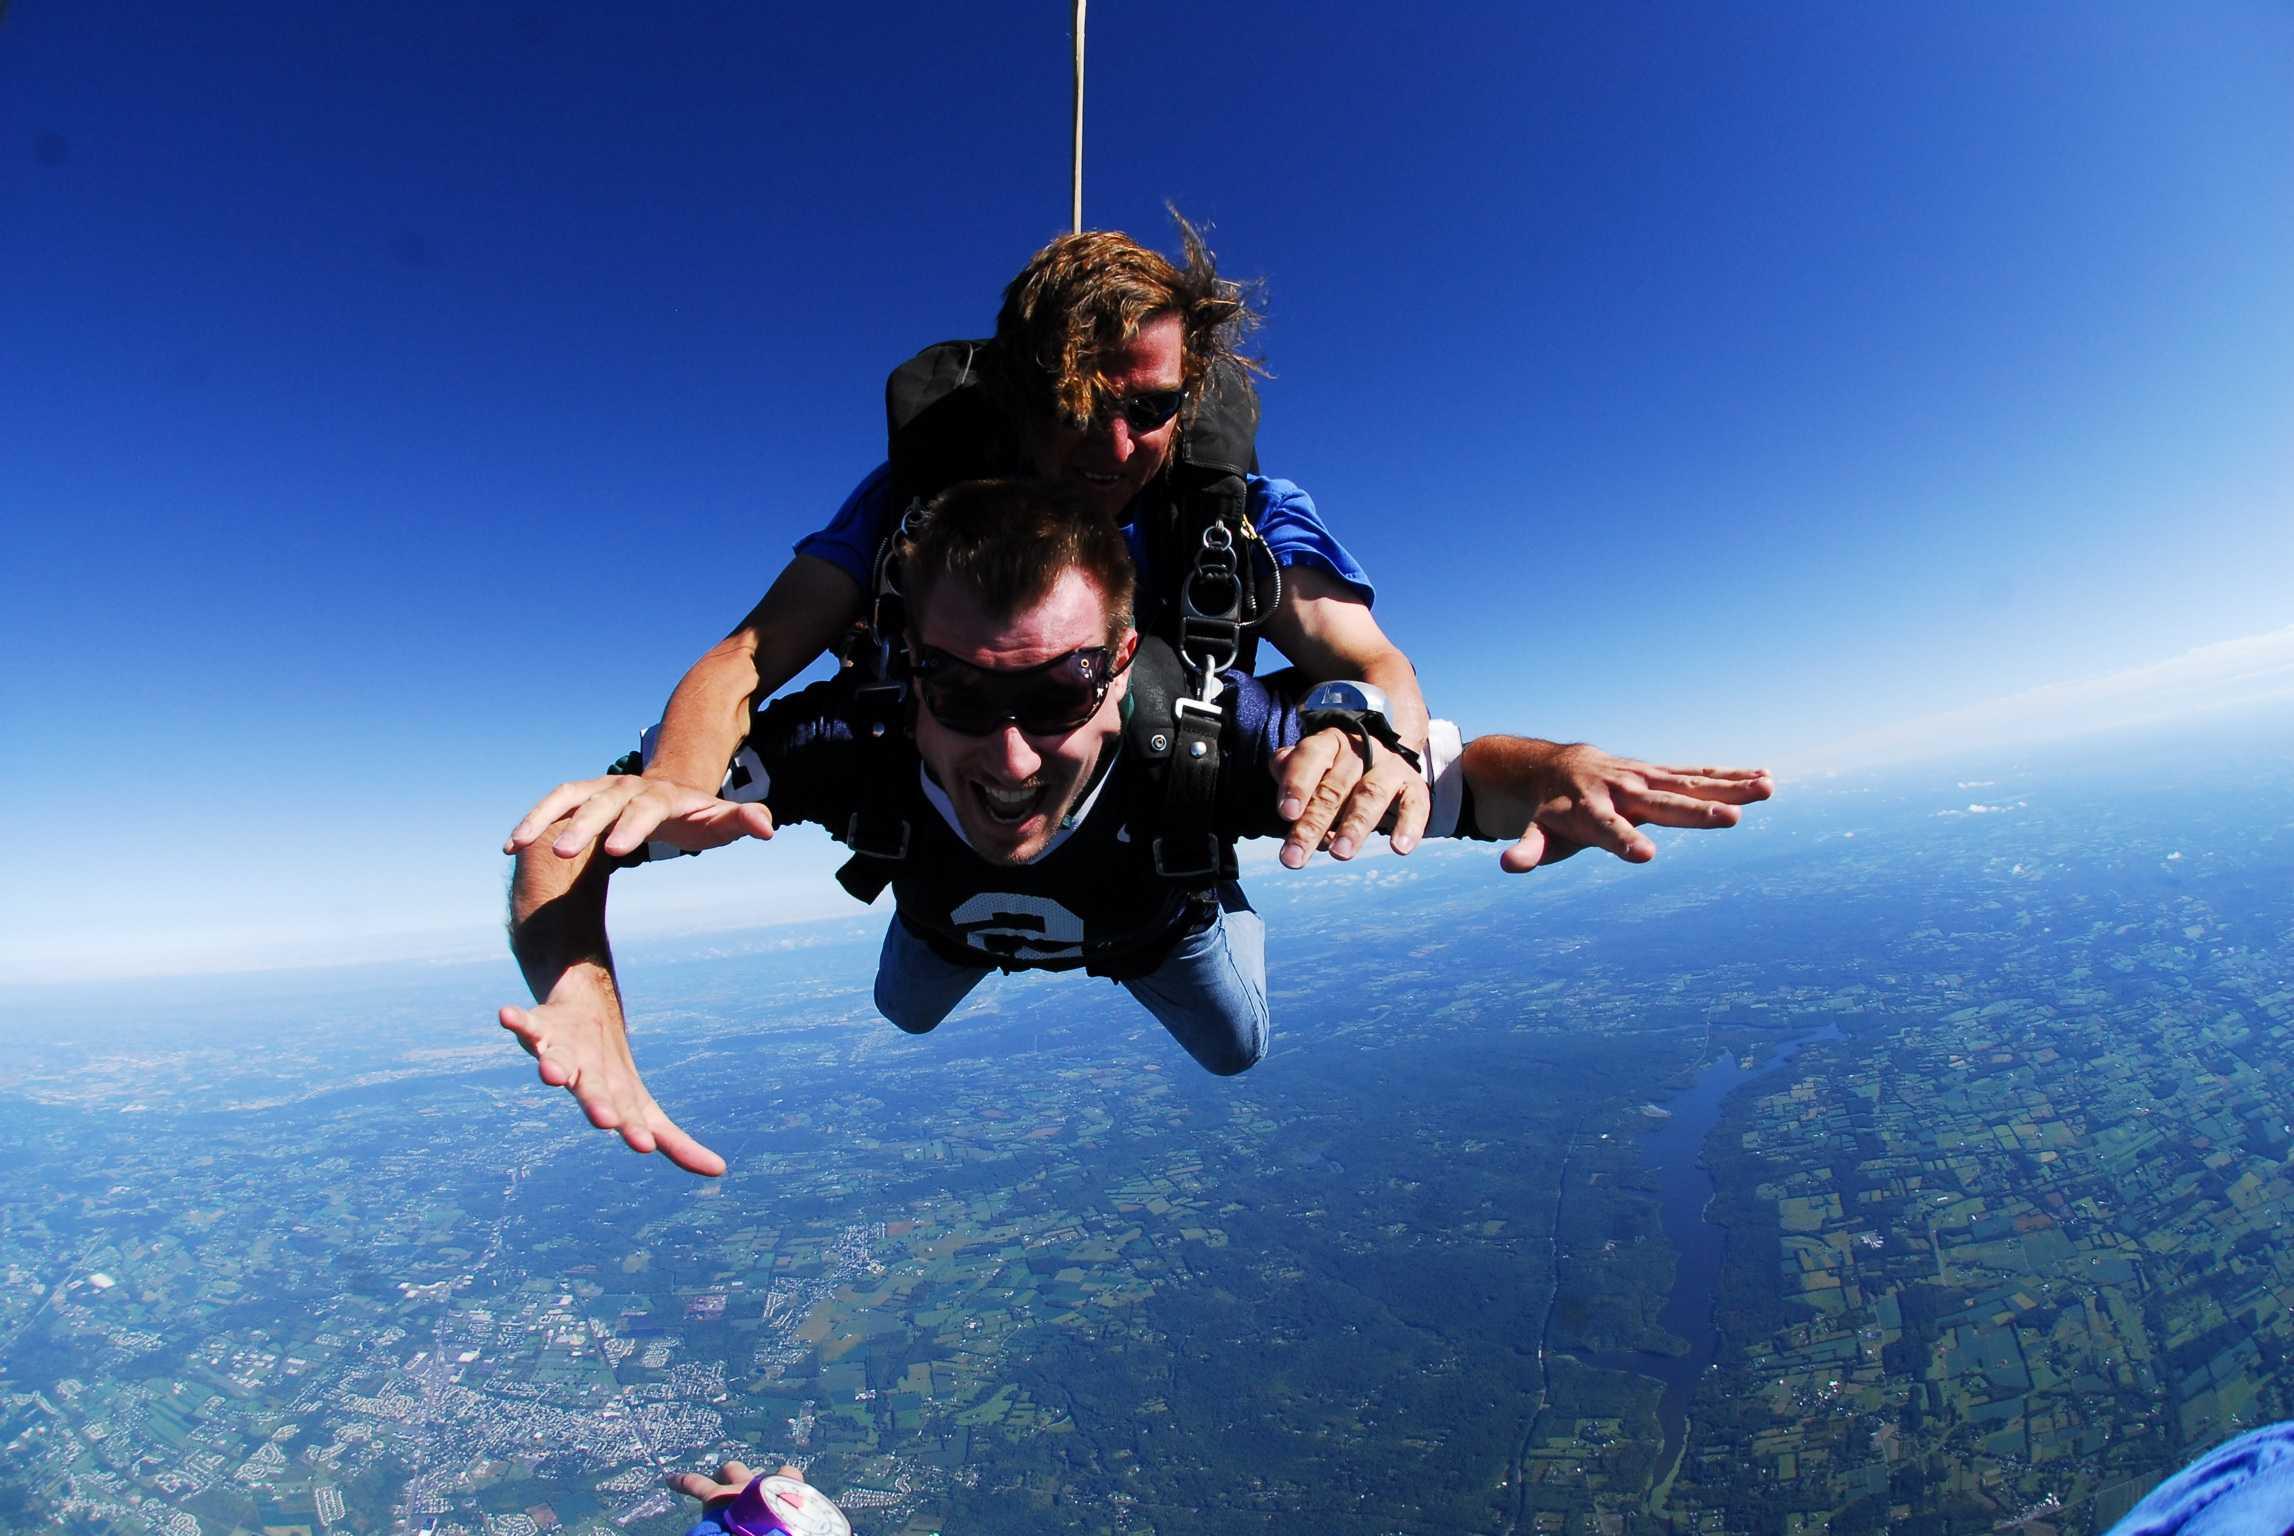 English teacher Jonathan Klingamen gave skydiving a try.